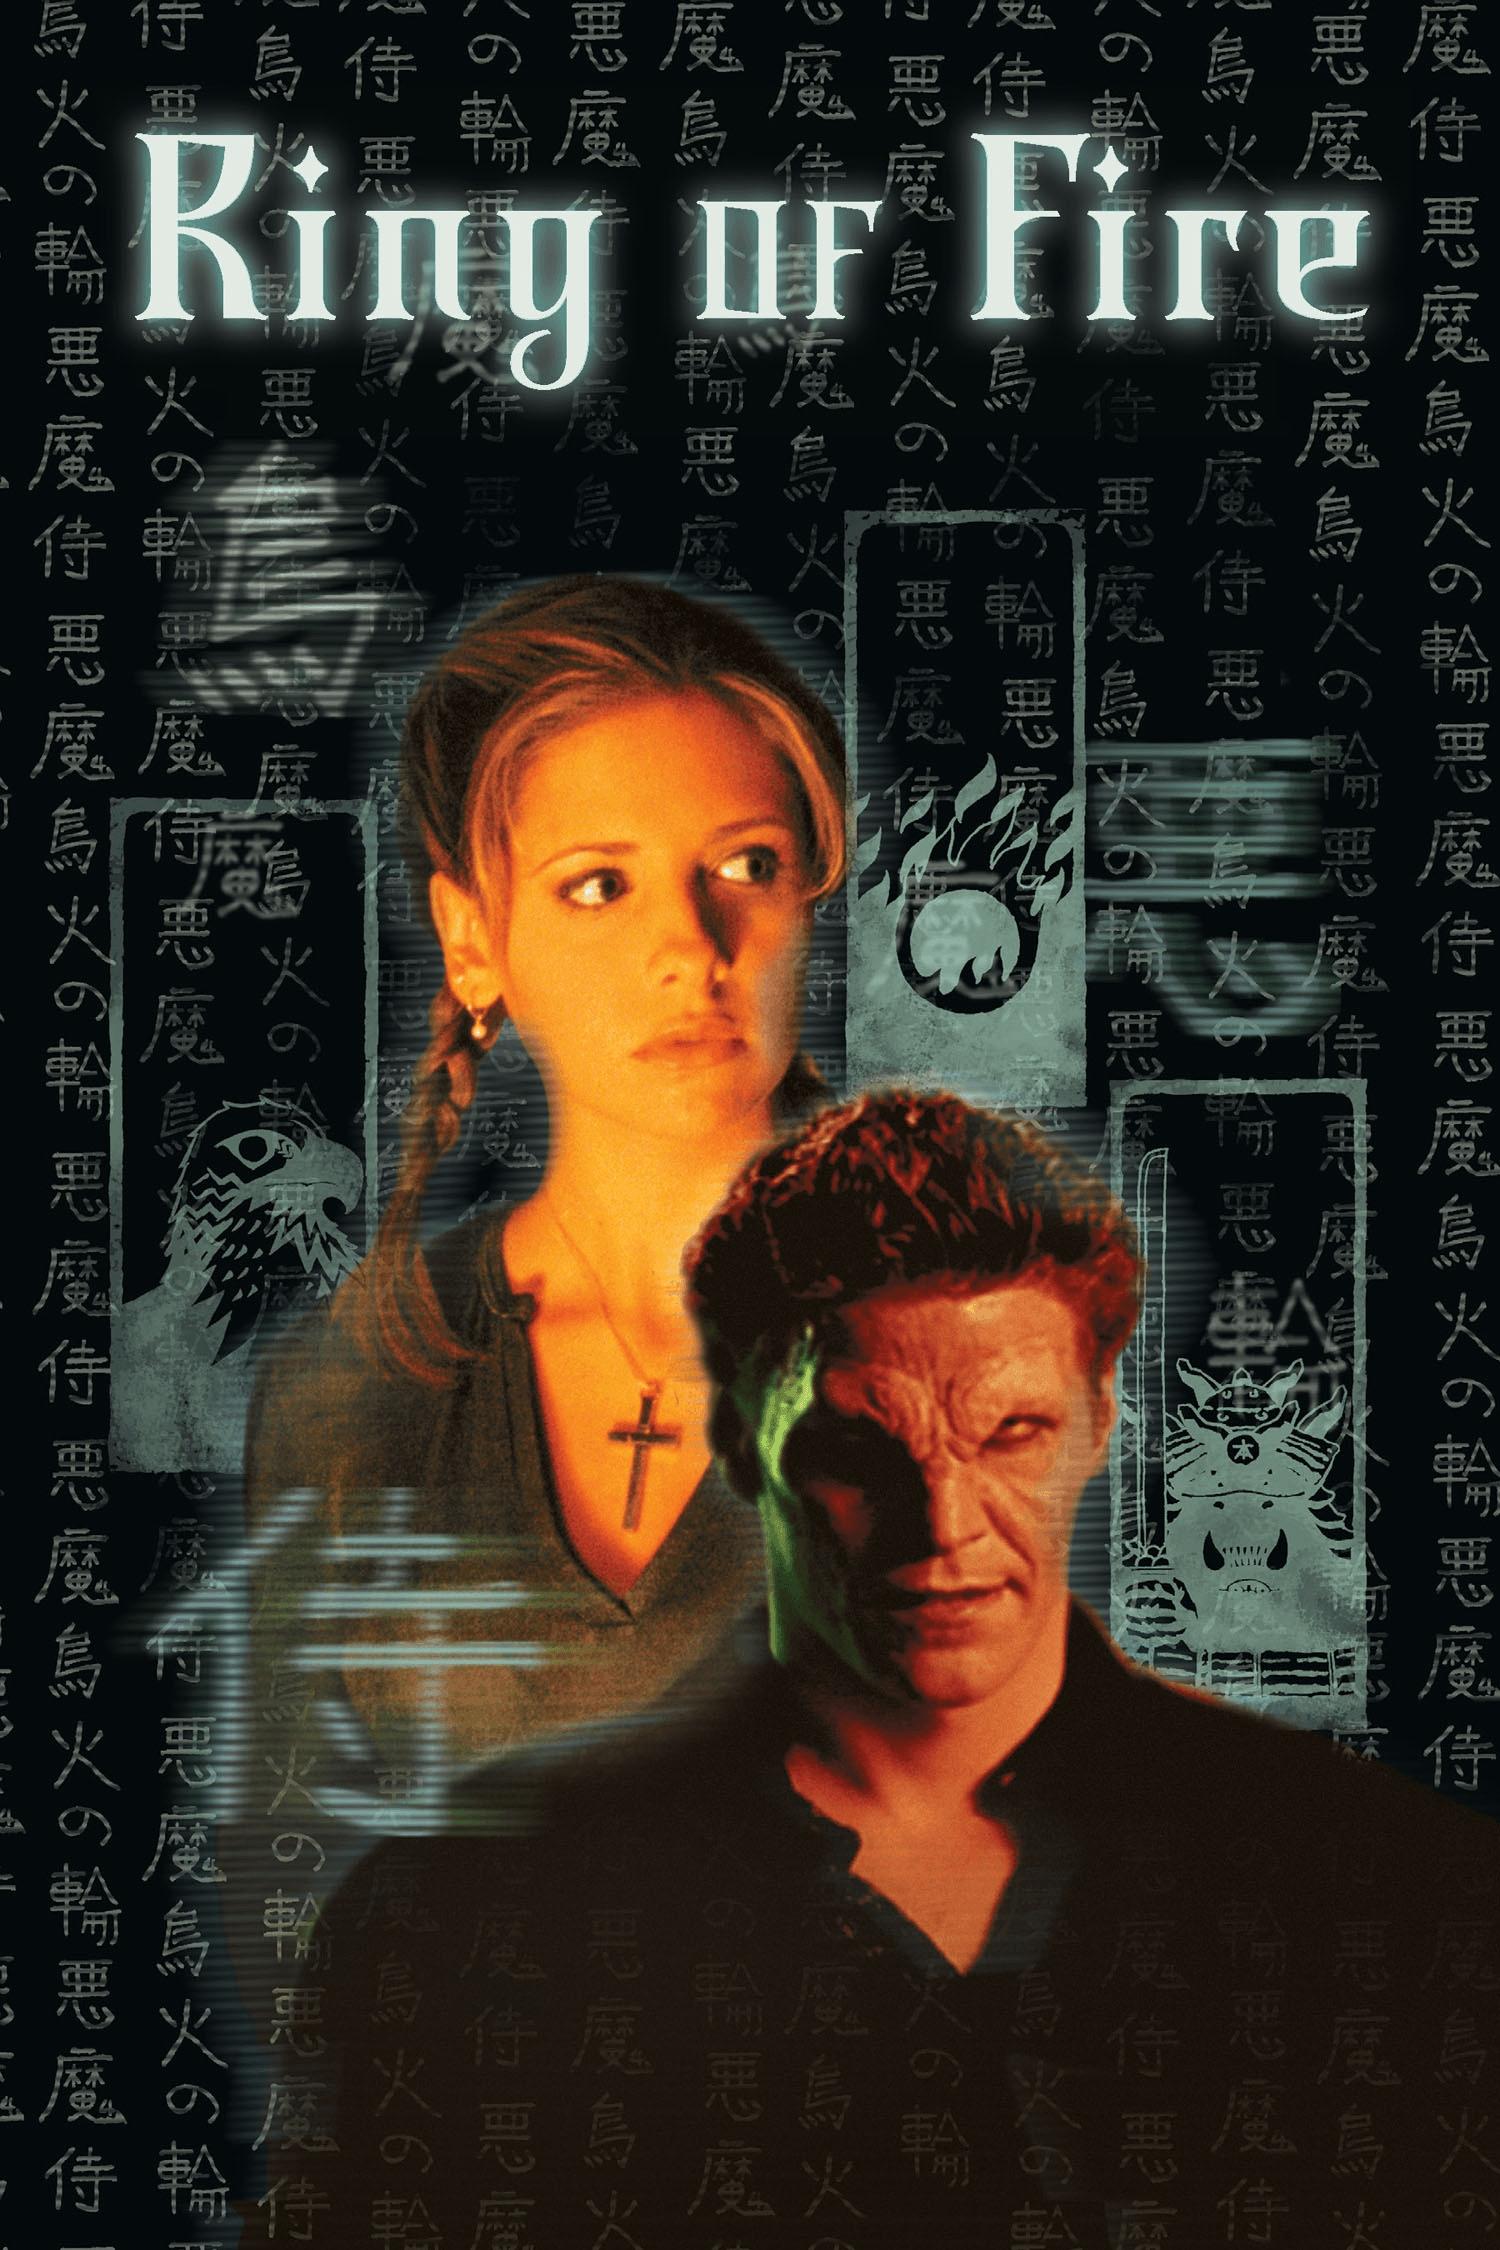 Read online Buffy the Vampire Slayer: Omnibus comic -  Issue # TPB 2 - 145